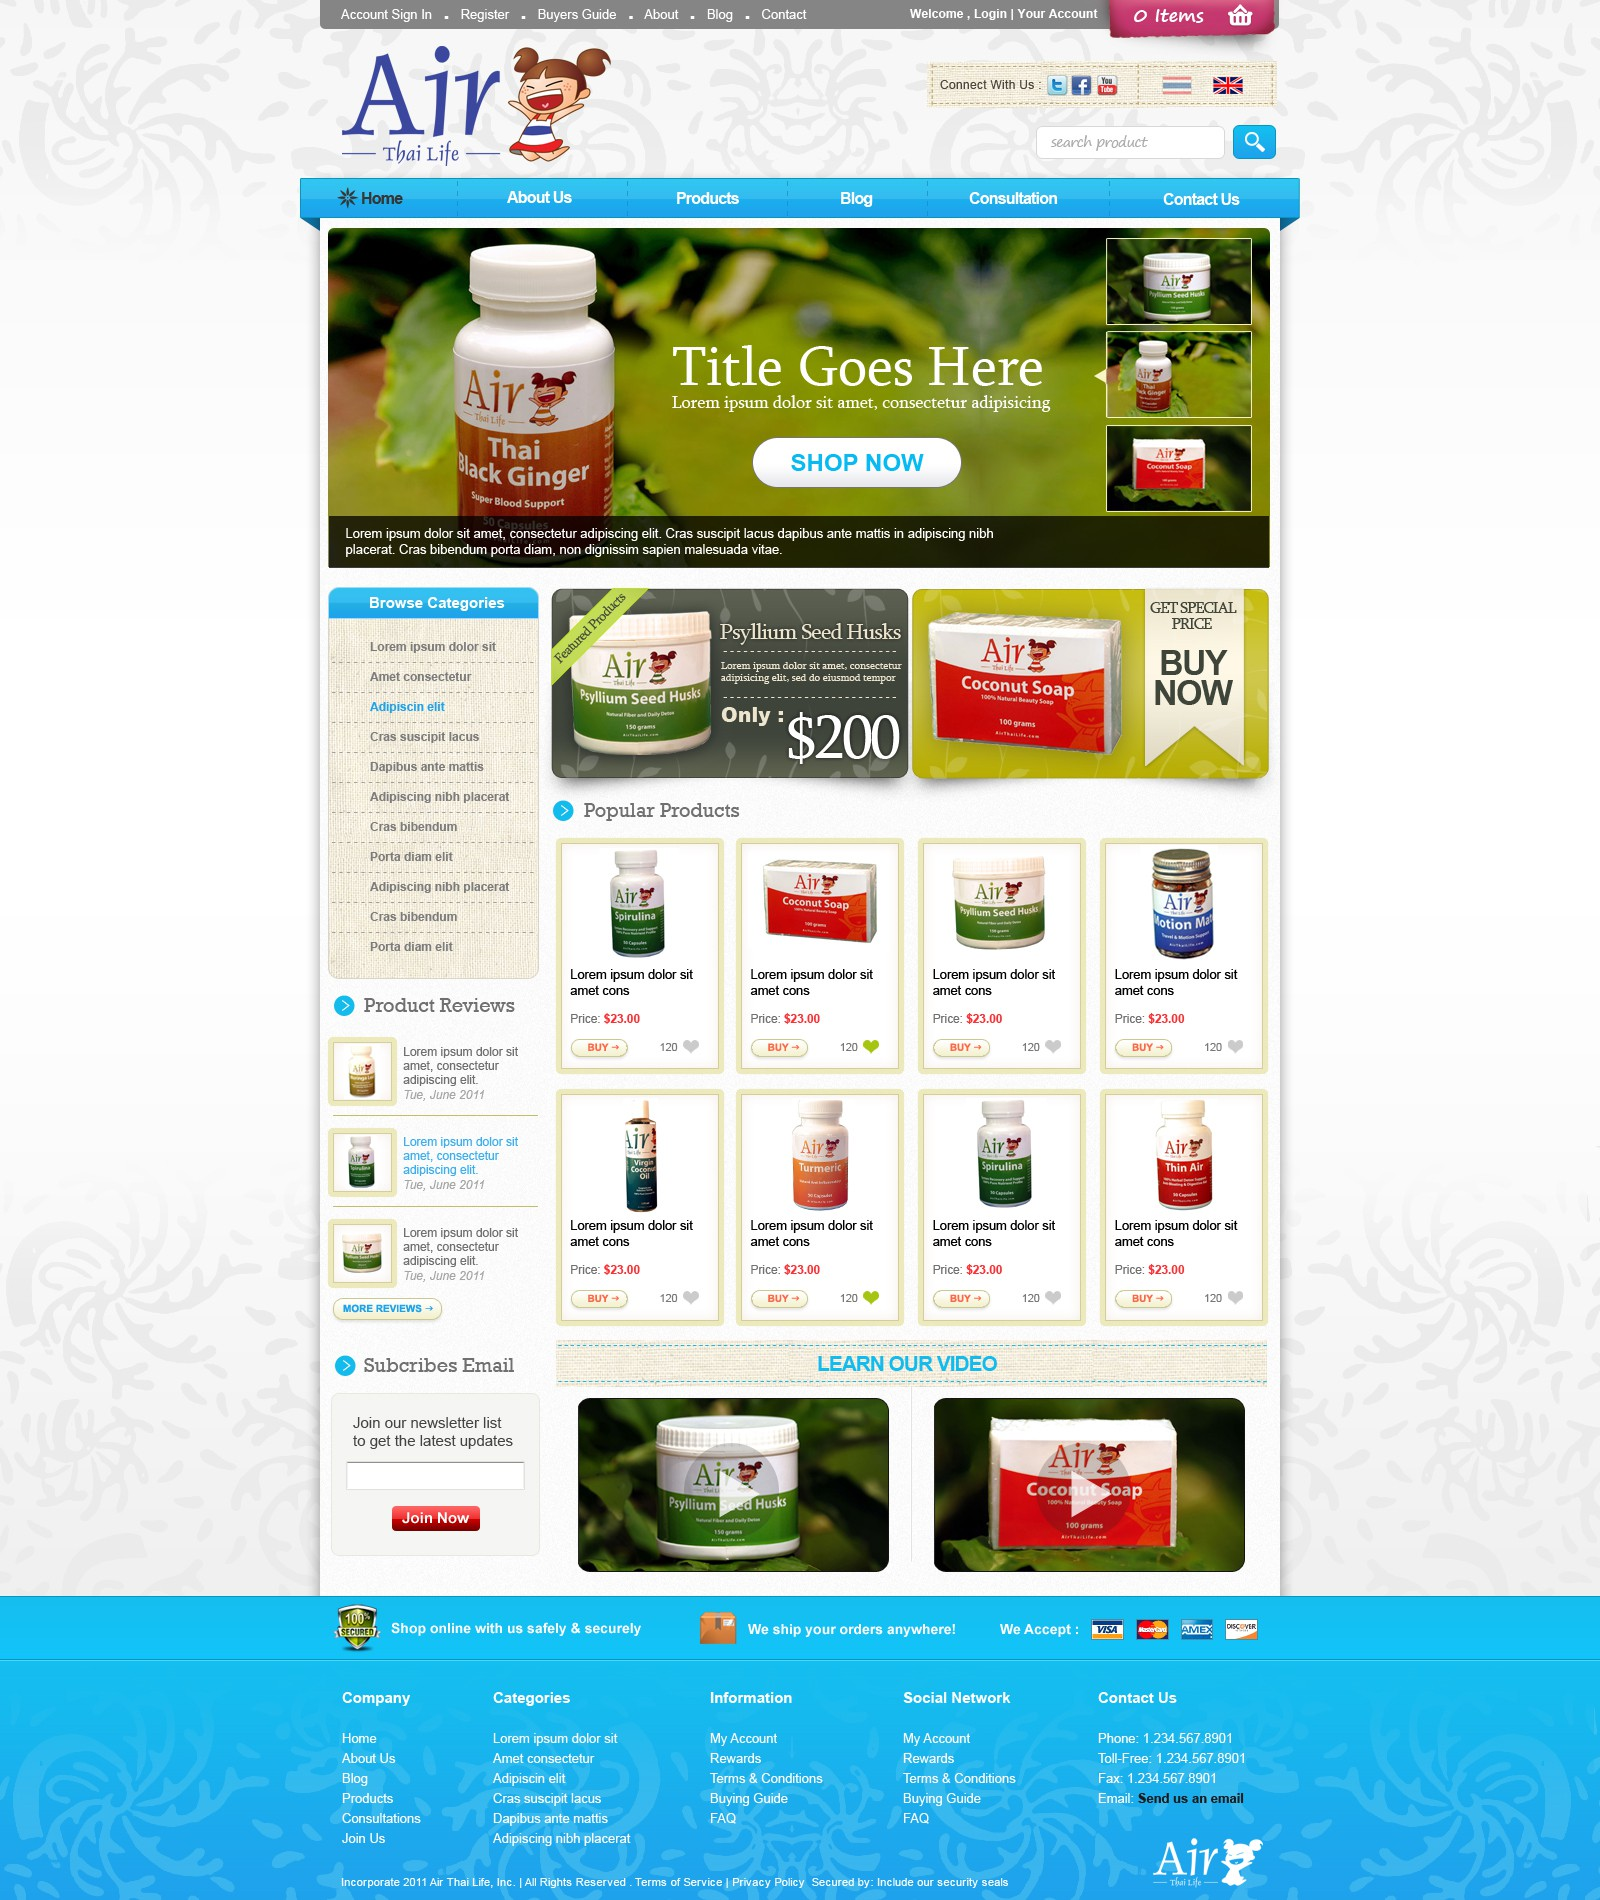 AIR THAI LIFE needs a new website design